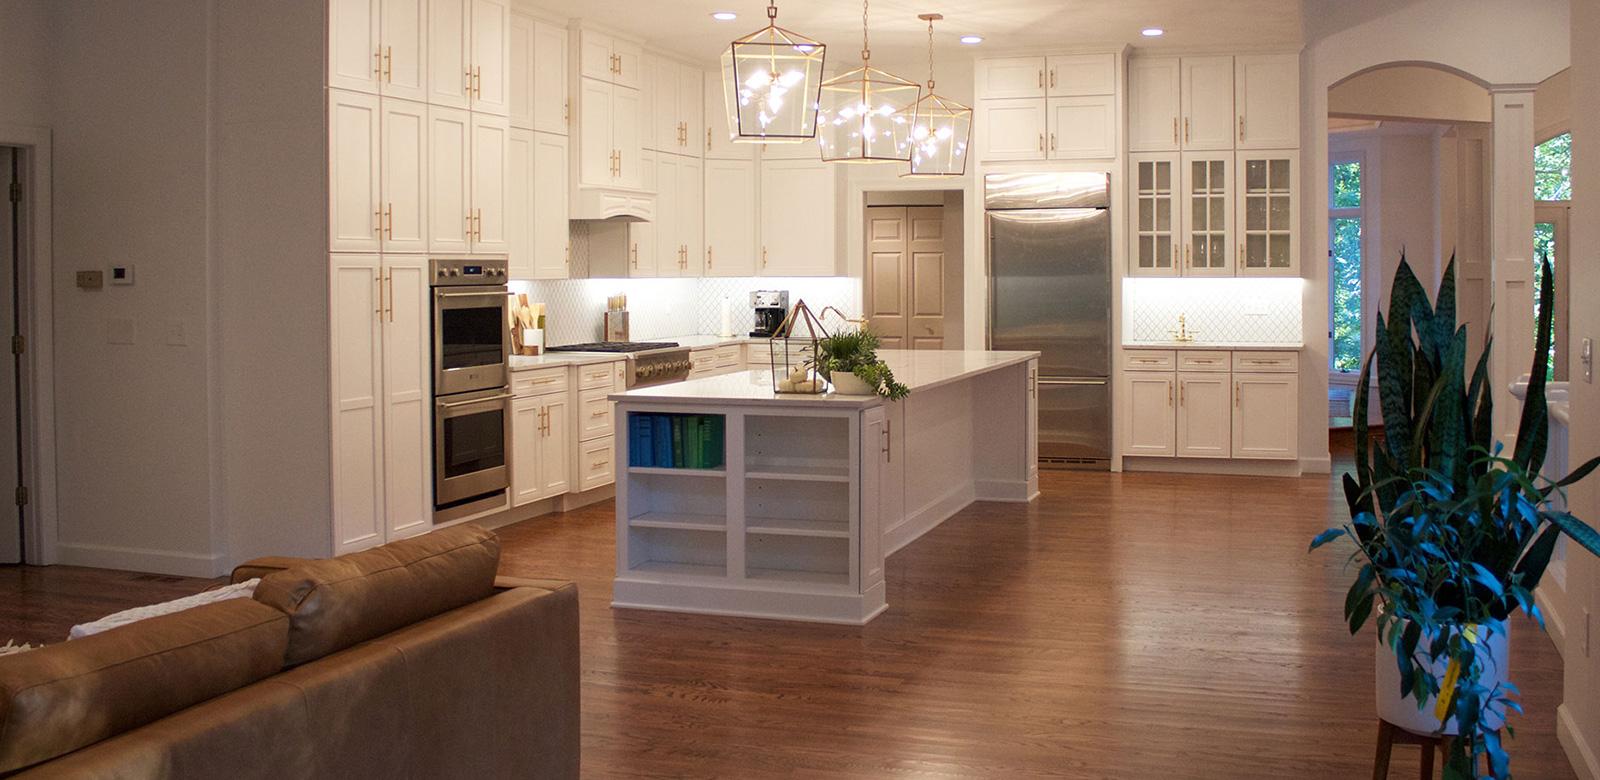 padgett building & remodeling – quality craftsmanship